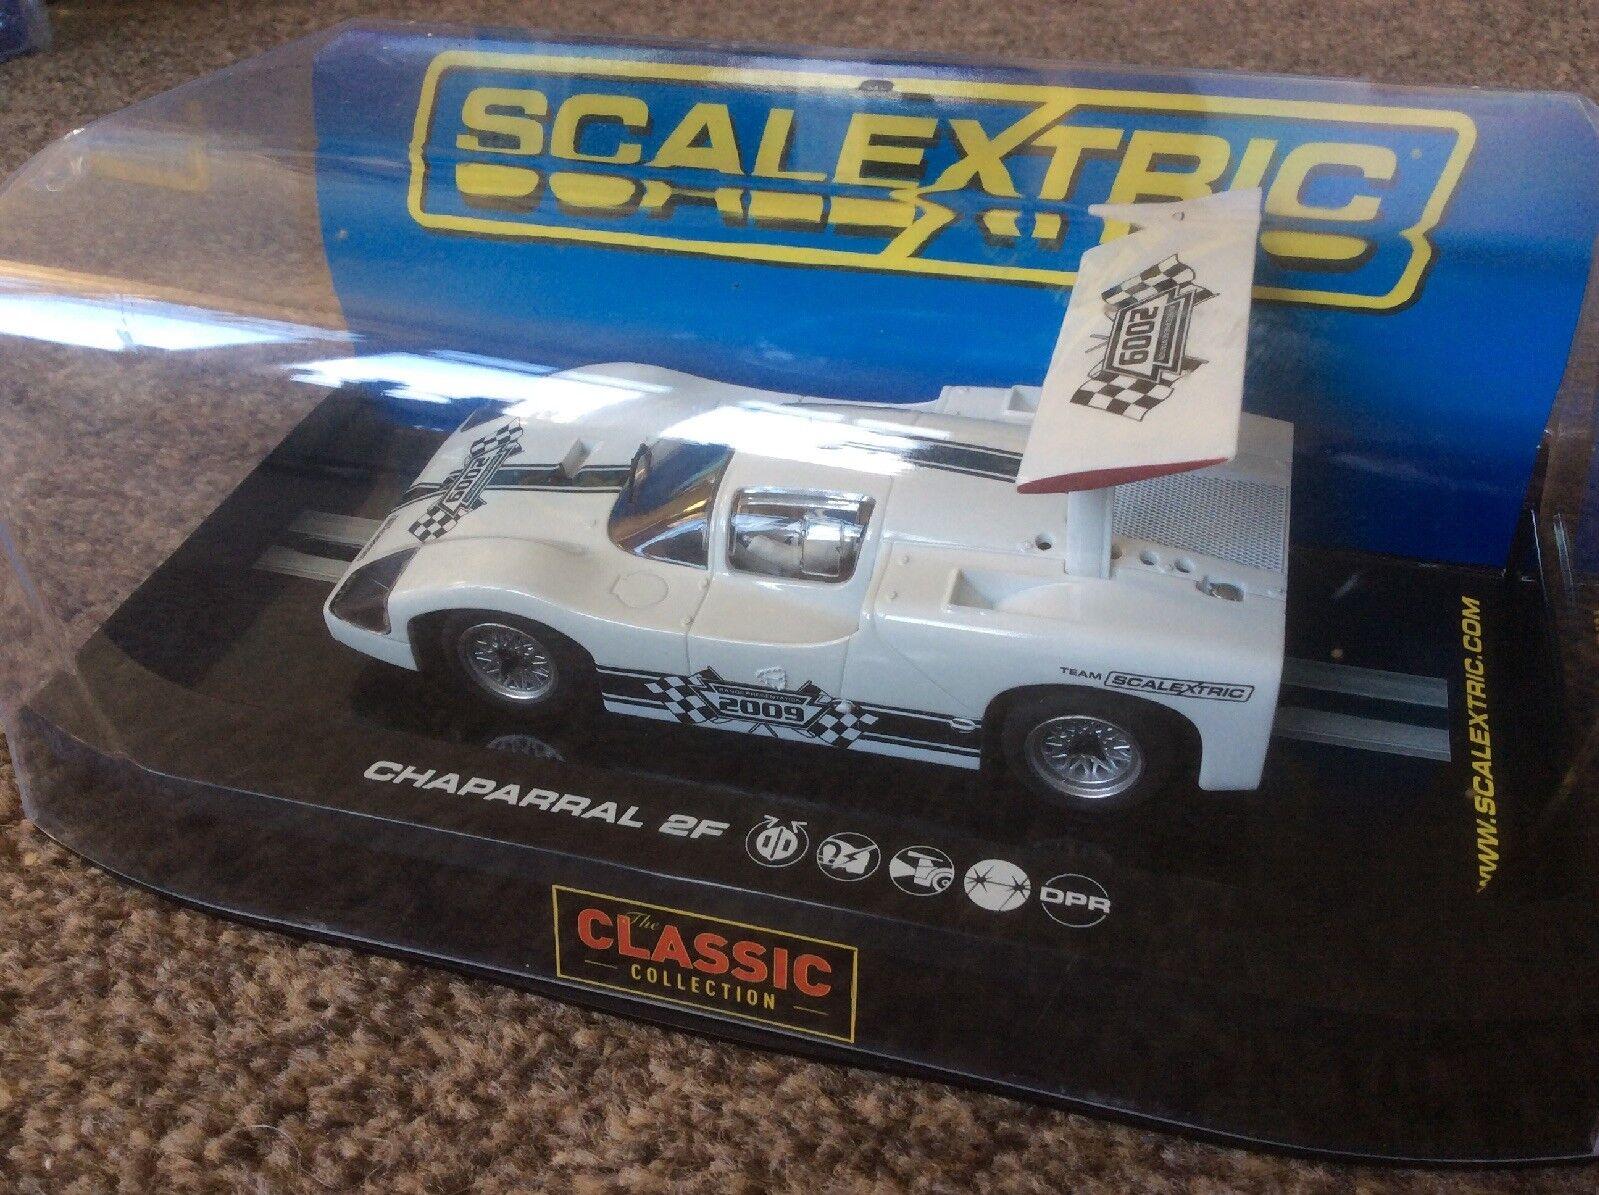 Salextric C2968 Chaparral 2F Range Presentation Model 2009 NEW Ltd No 228 of 250